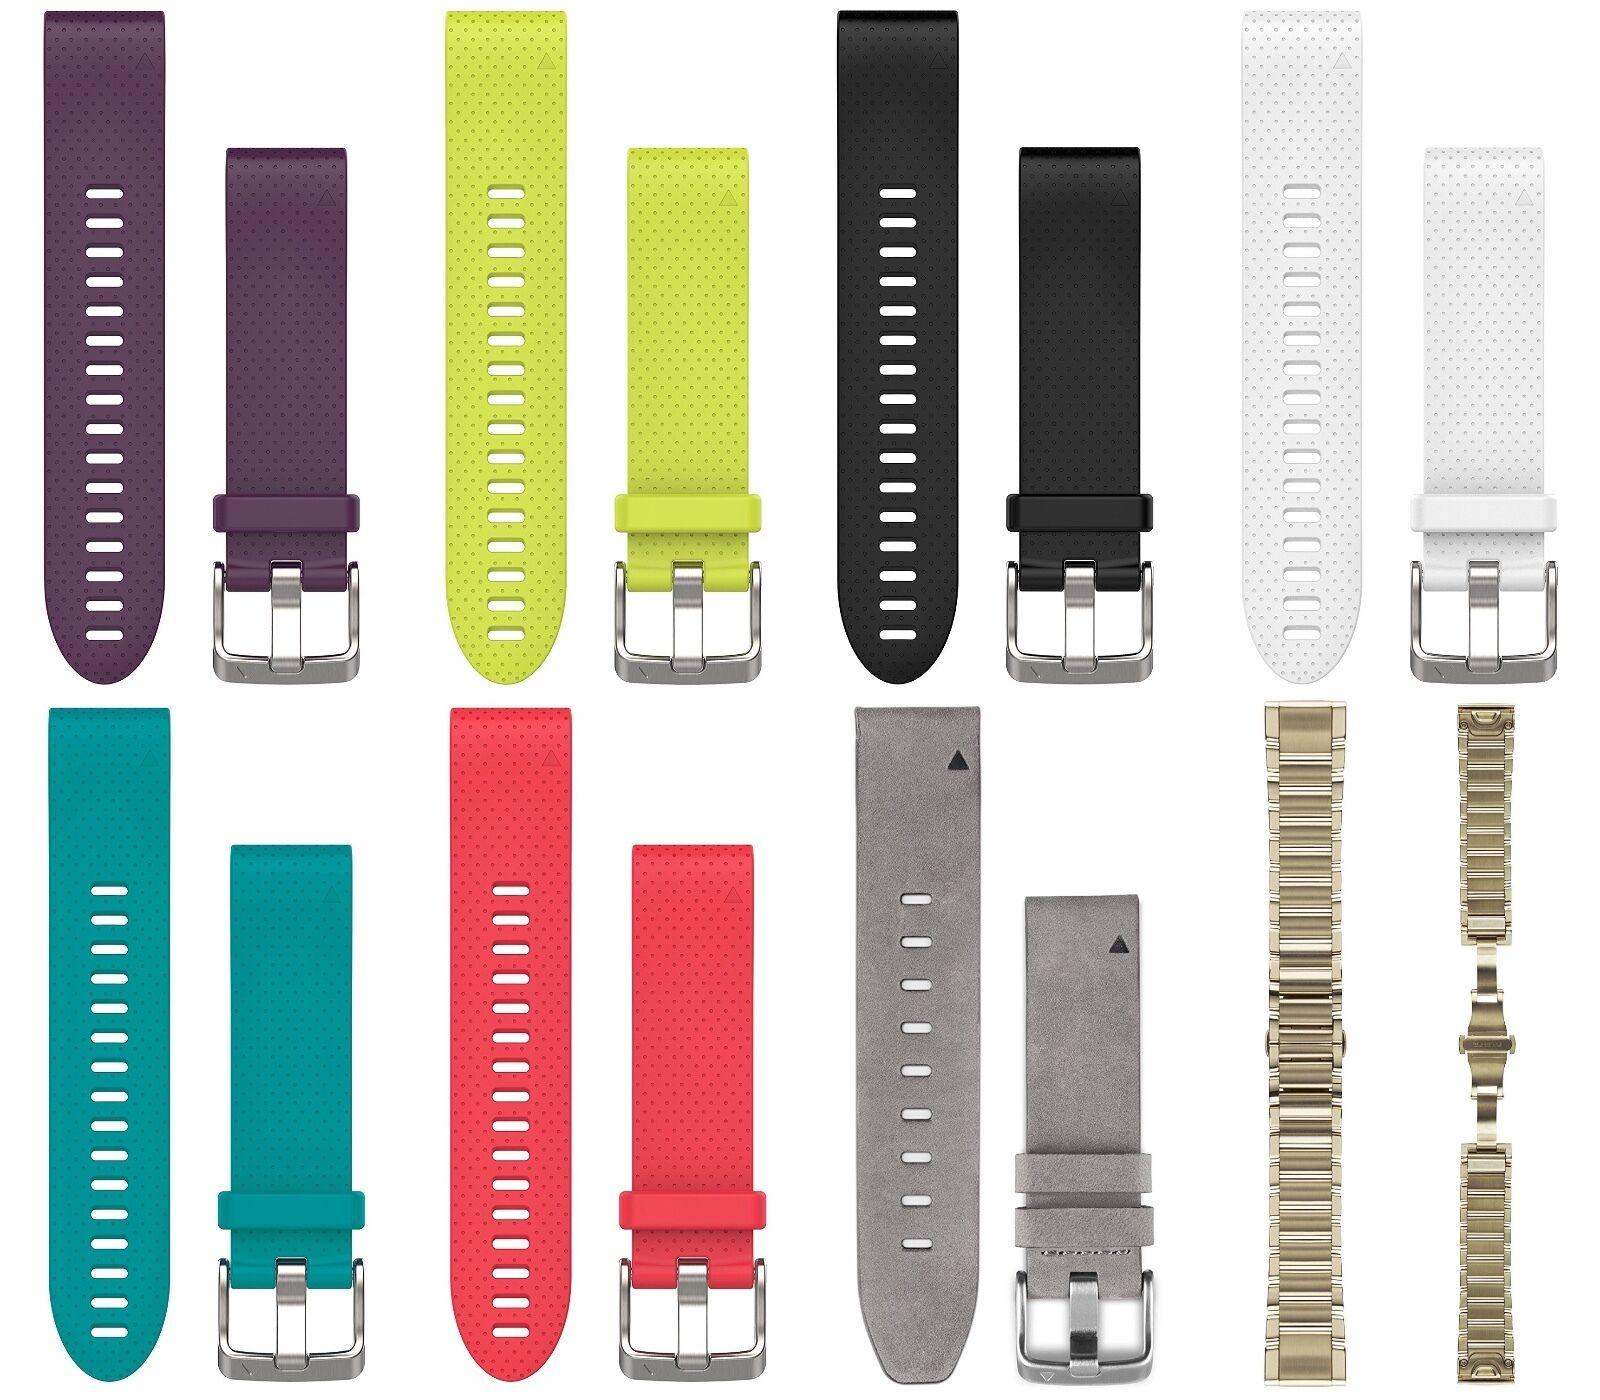 Garmin Quickfit ™ 20 reemplazo Correas De Reloj Garmin Fenix 5S, Sapphire, 5S Plus